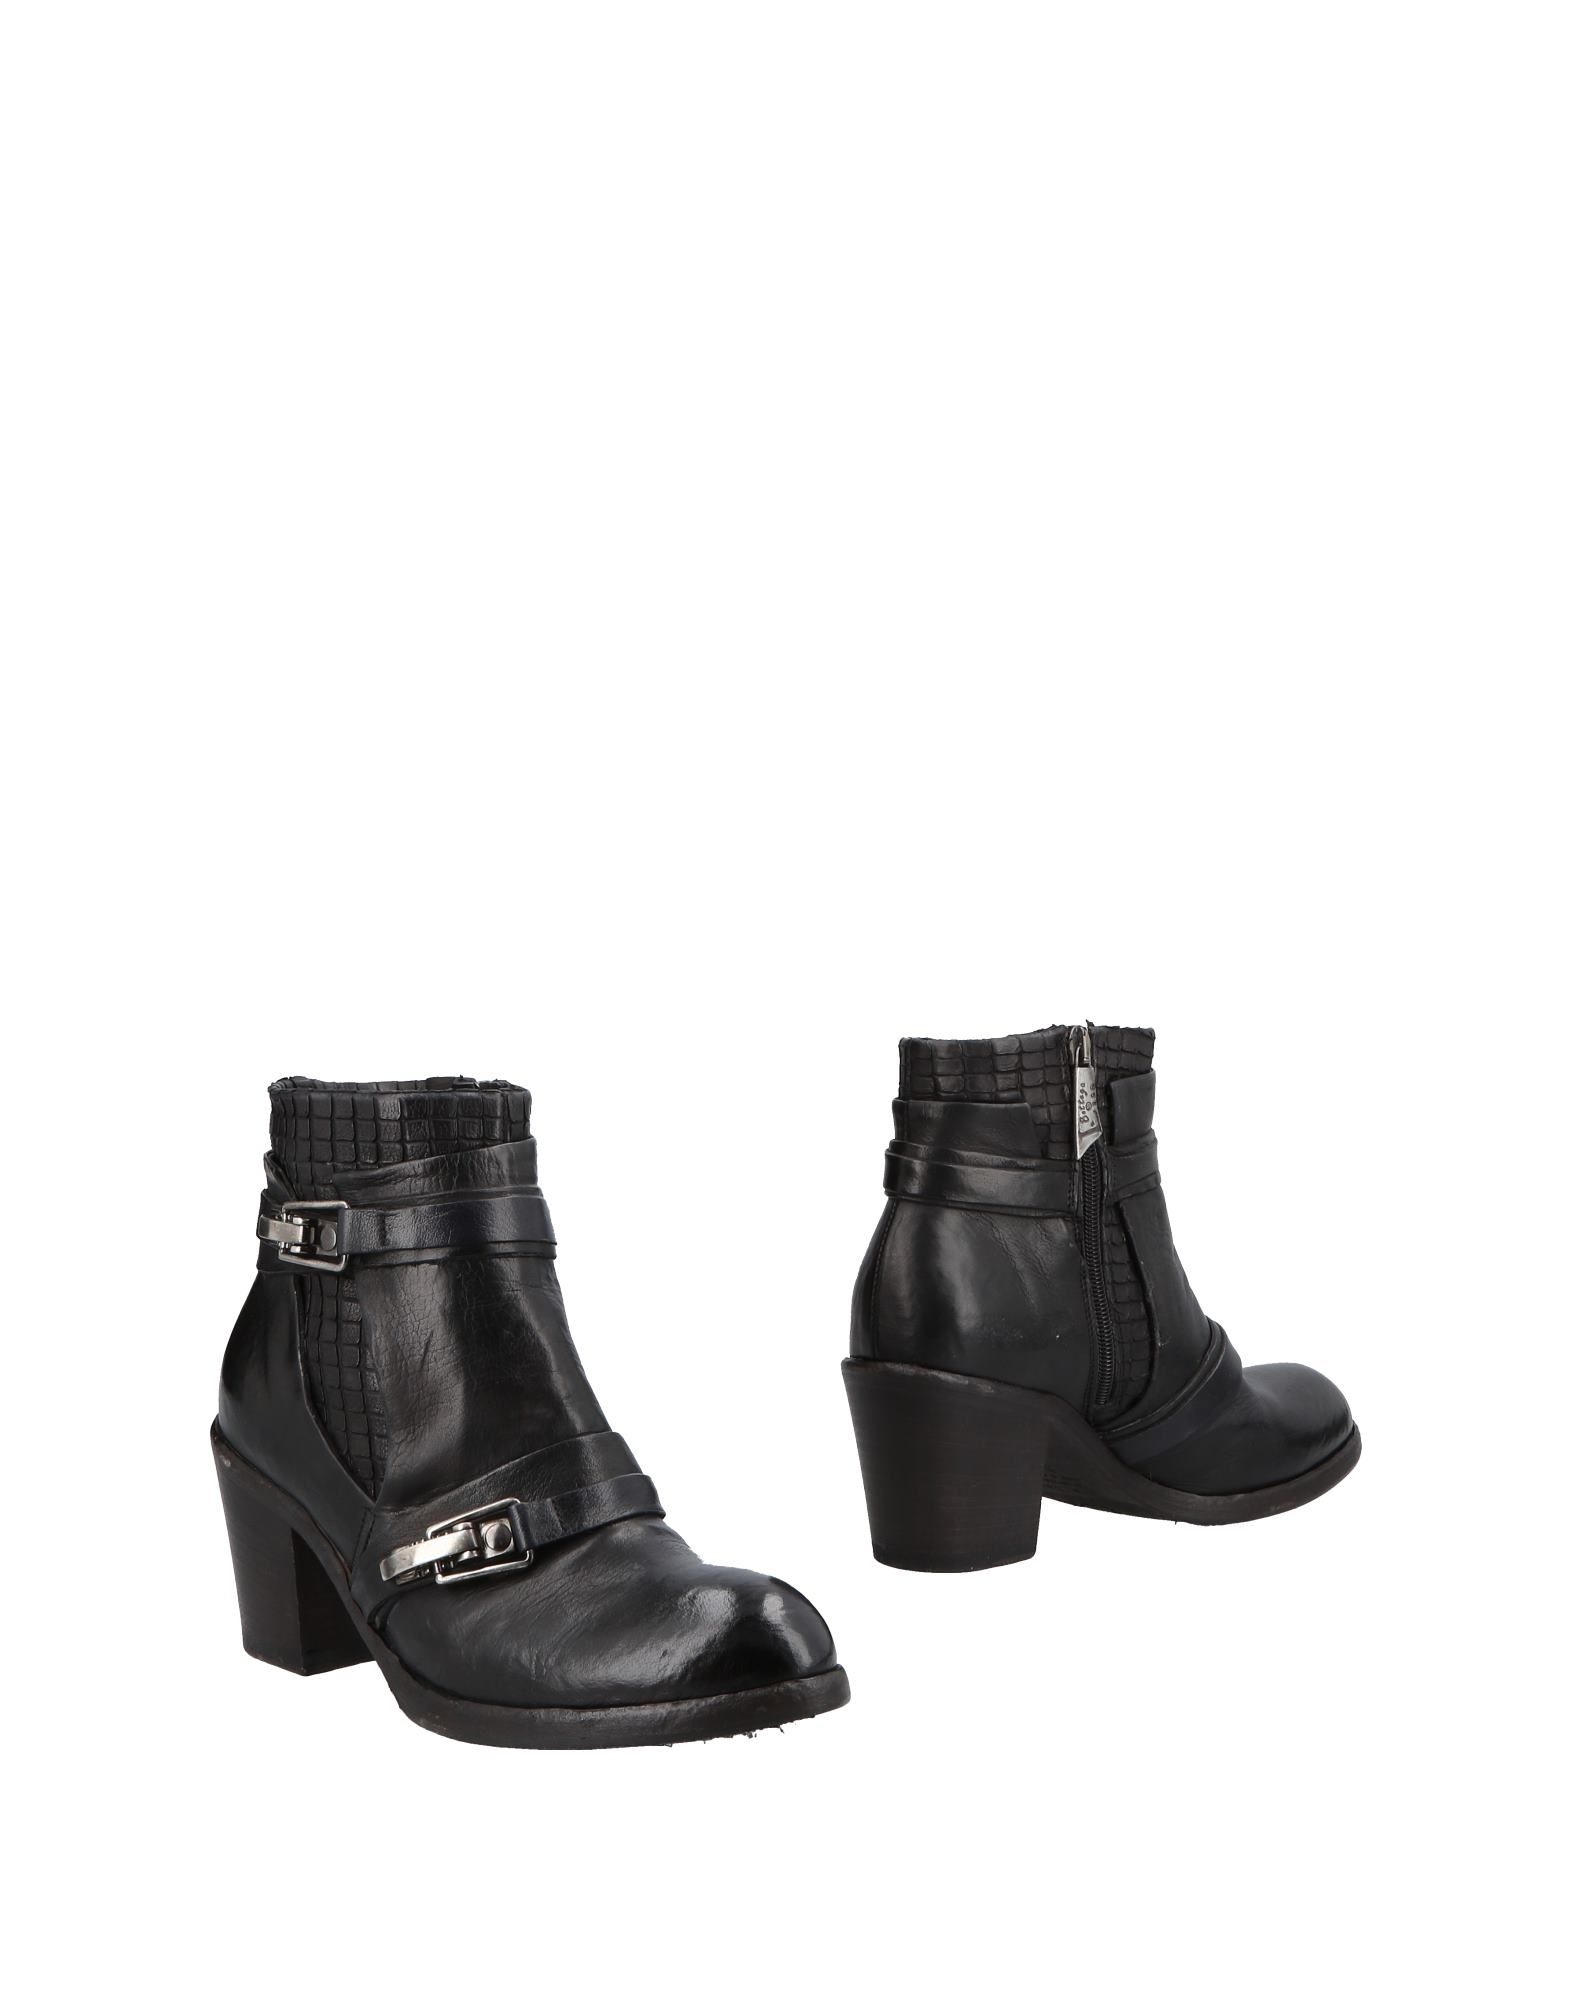 La Bottega 11502789APGut Di Lisa Stiefelette Damen  11502789APGut Bottega aussehende strapazierfähige Schuhe 1d9100